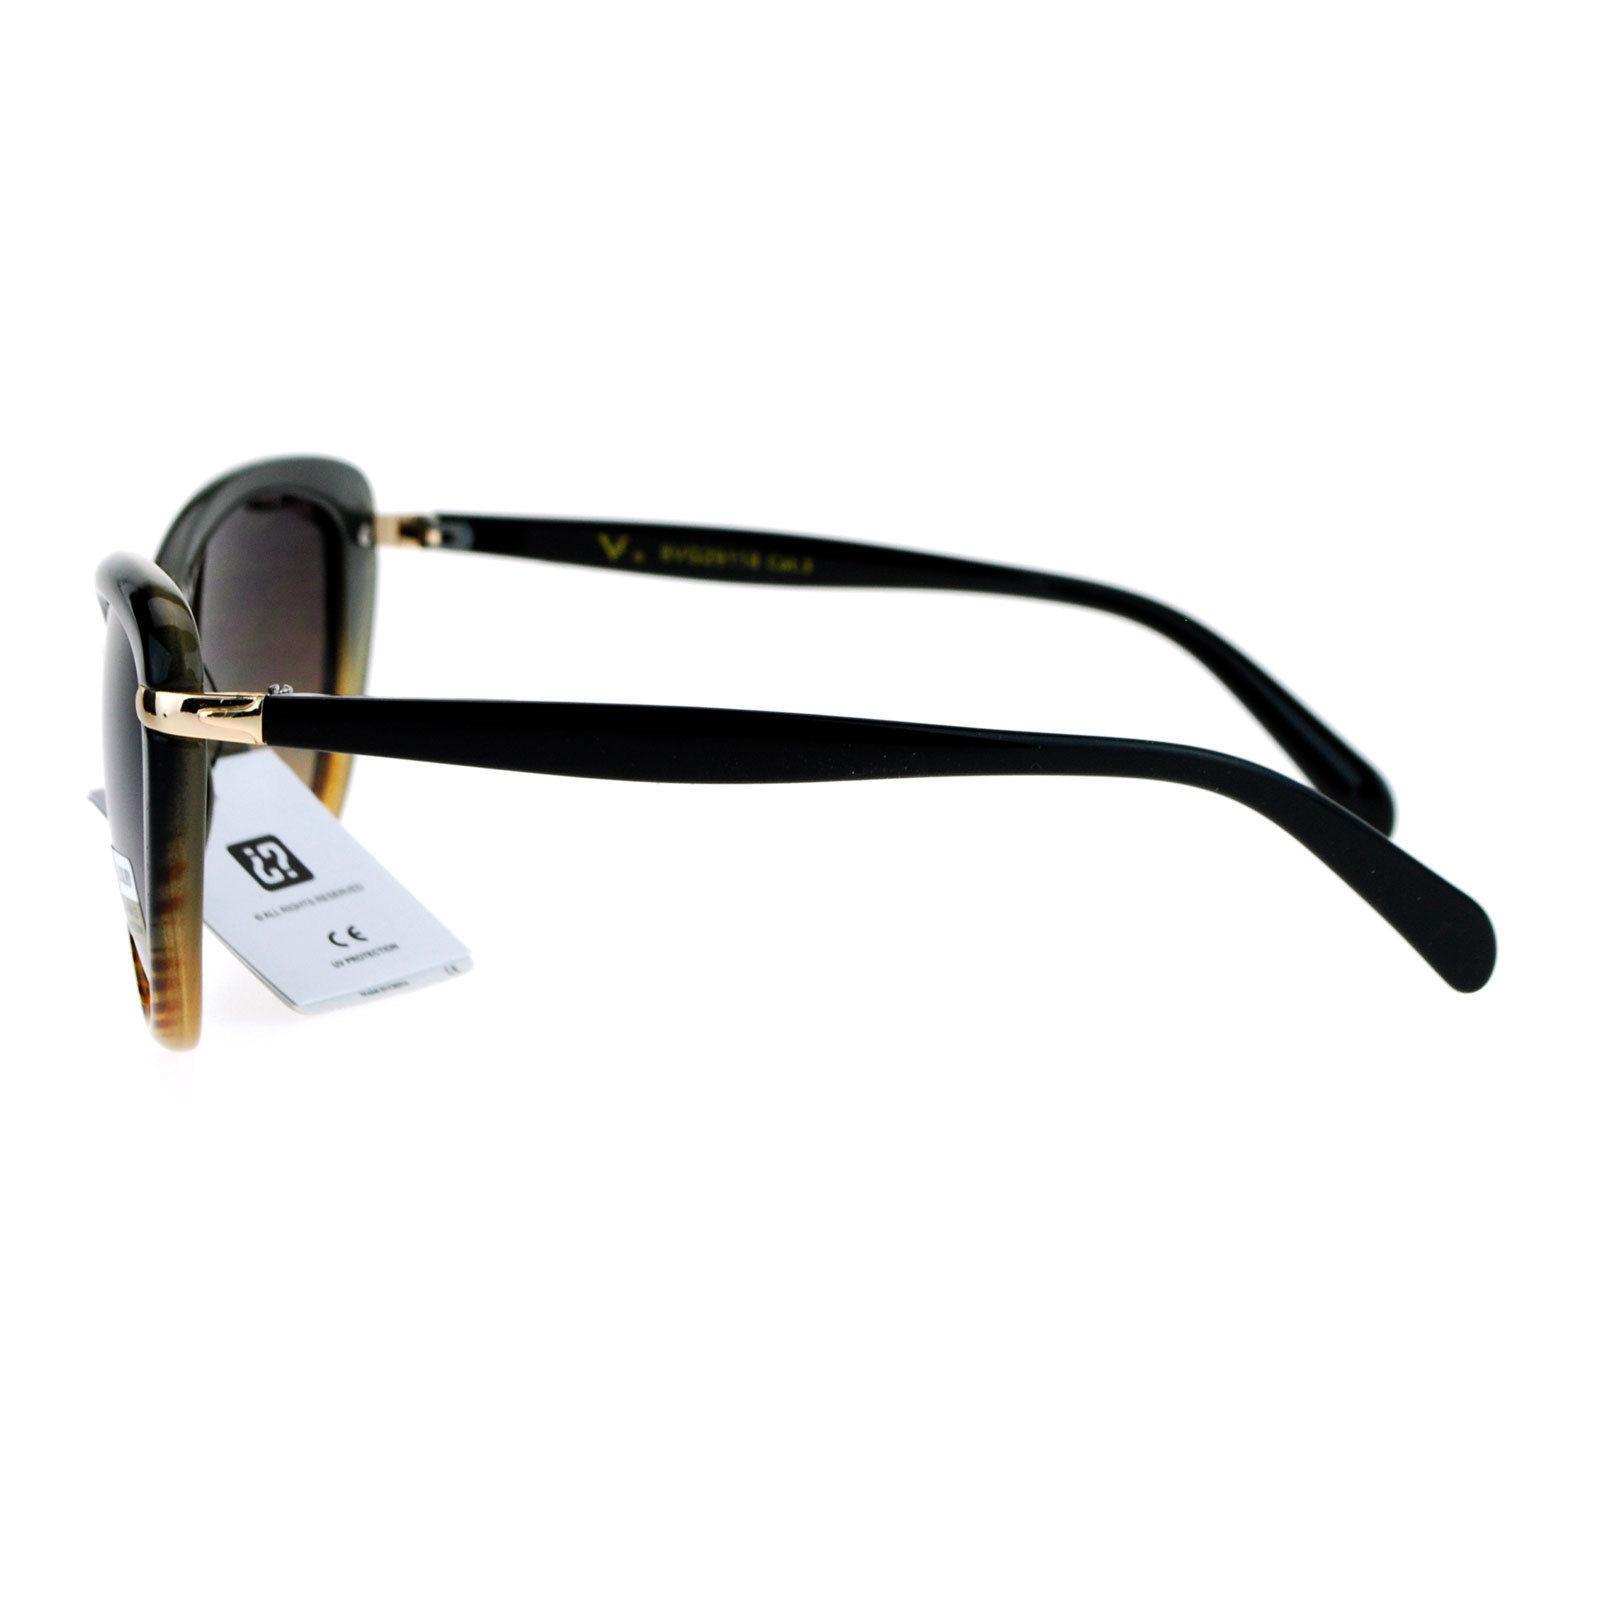 VG Luxury Sunglasses Womens Cat Eye Designer Fashion Shades UV 400